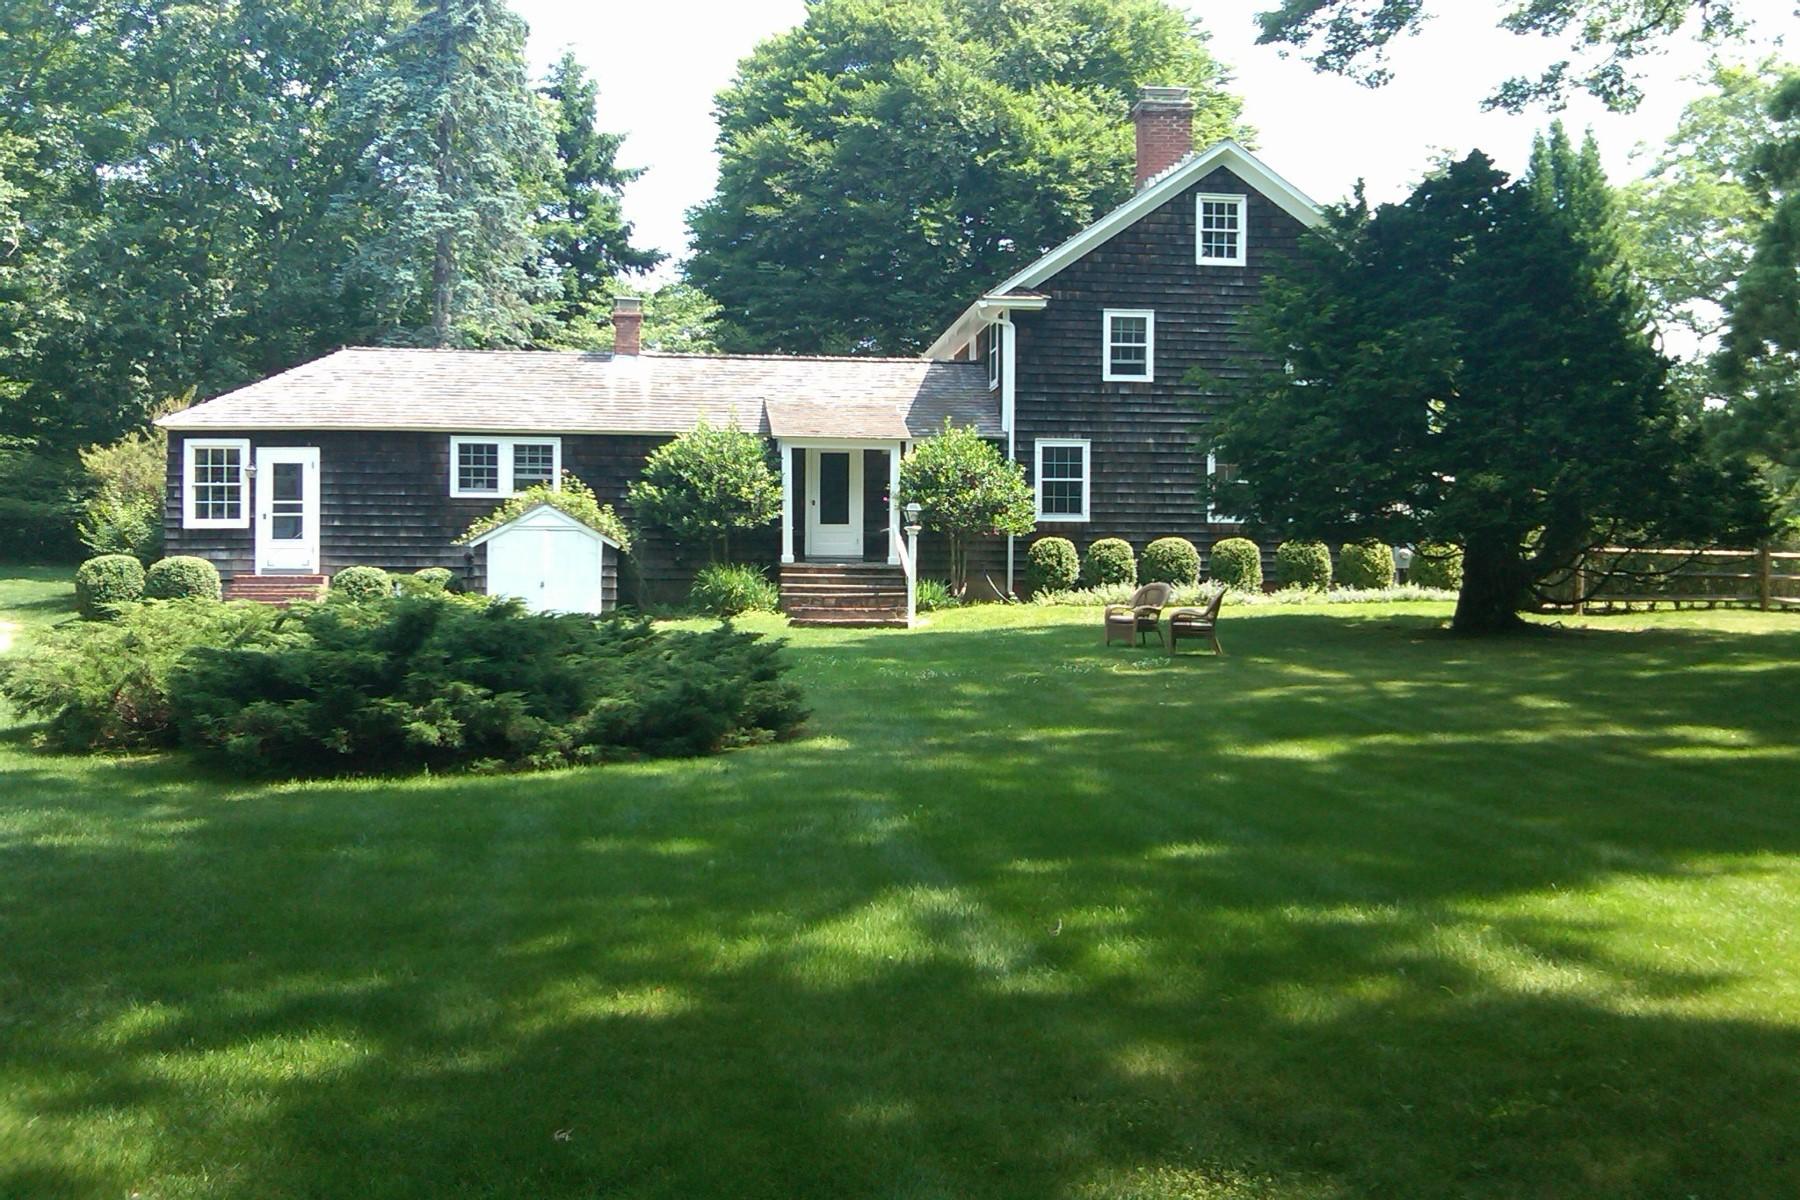 Single Family Home for Rent at Village Charmer East Hampton Village, East Hampton, New York 11937 United States